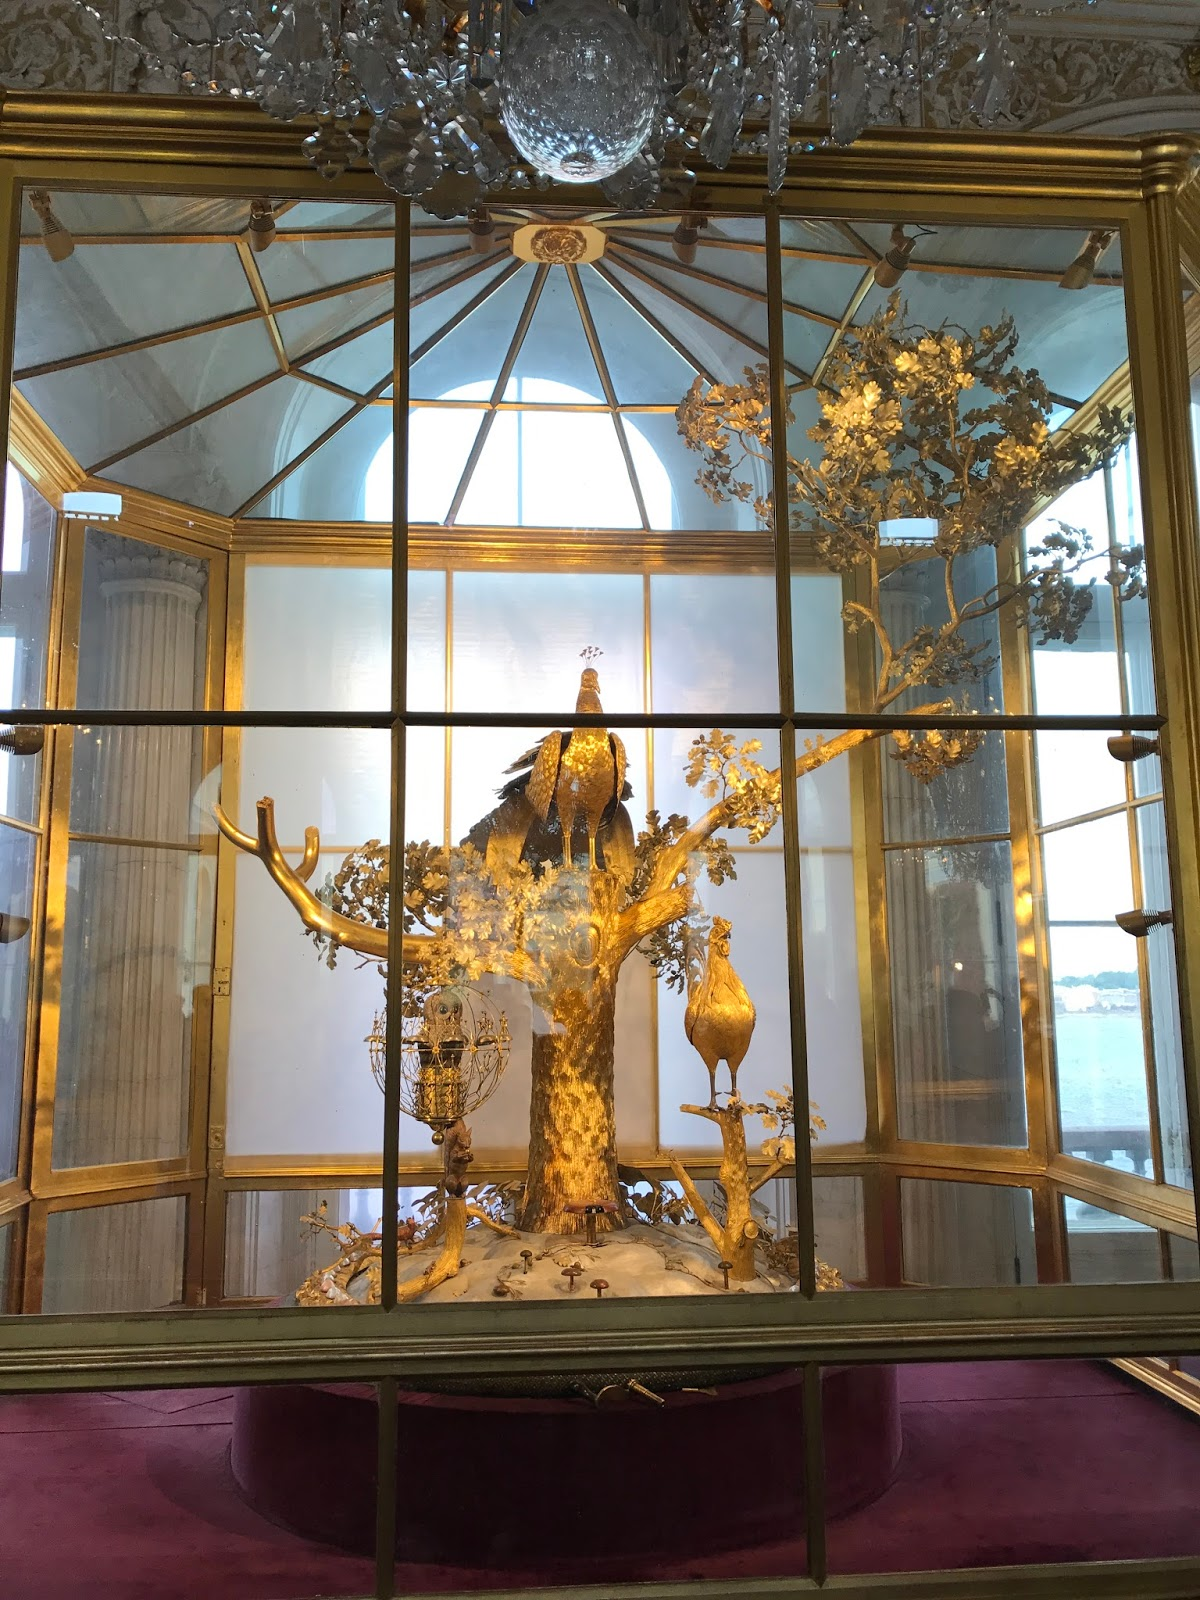 Peacock Clock - Hermitage